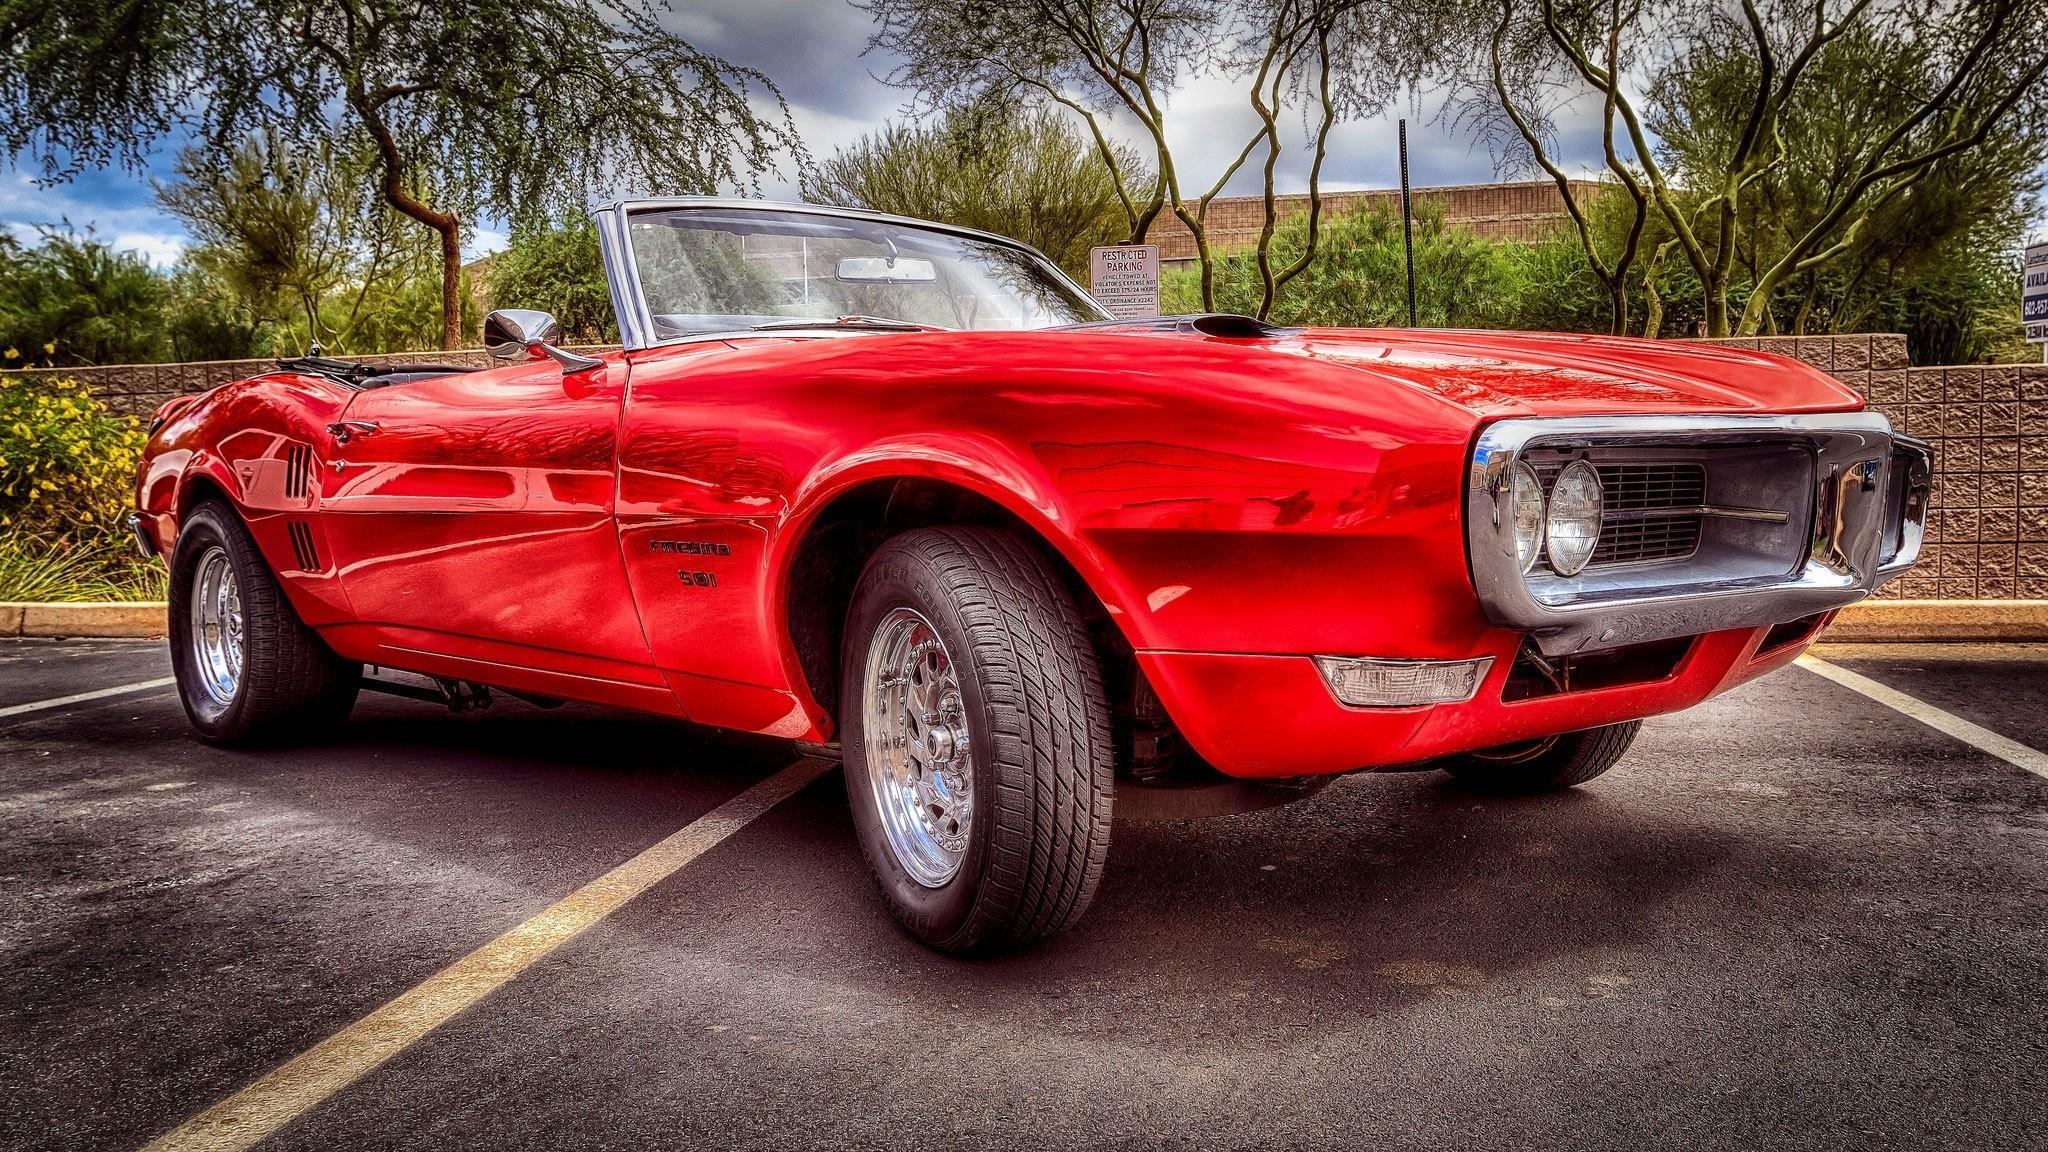 Res: 2048x1152, pontiac firebird faerbёd muscle car front hdr